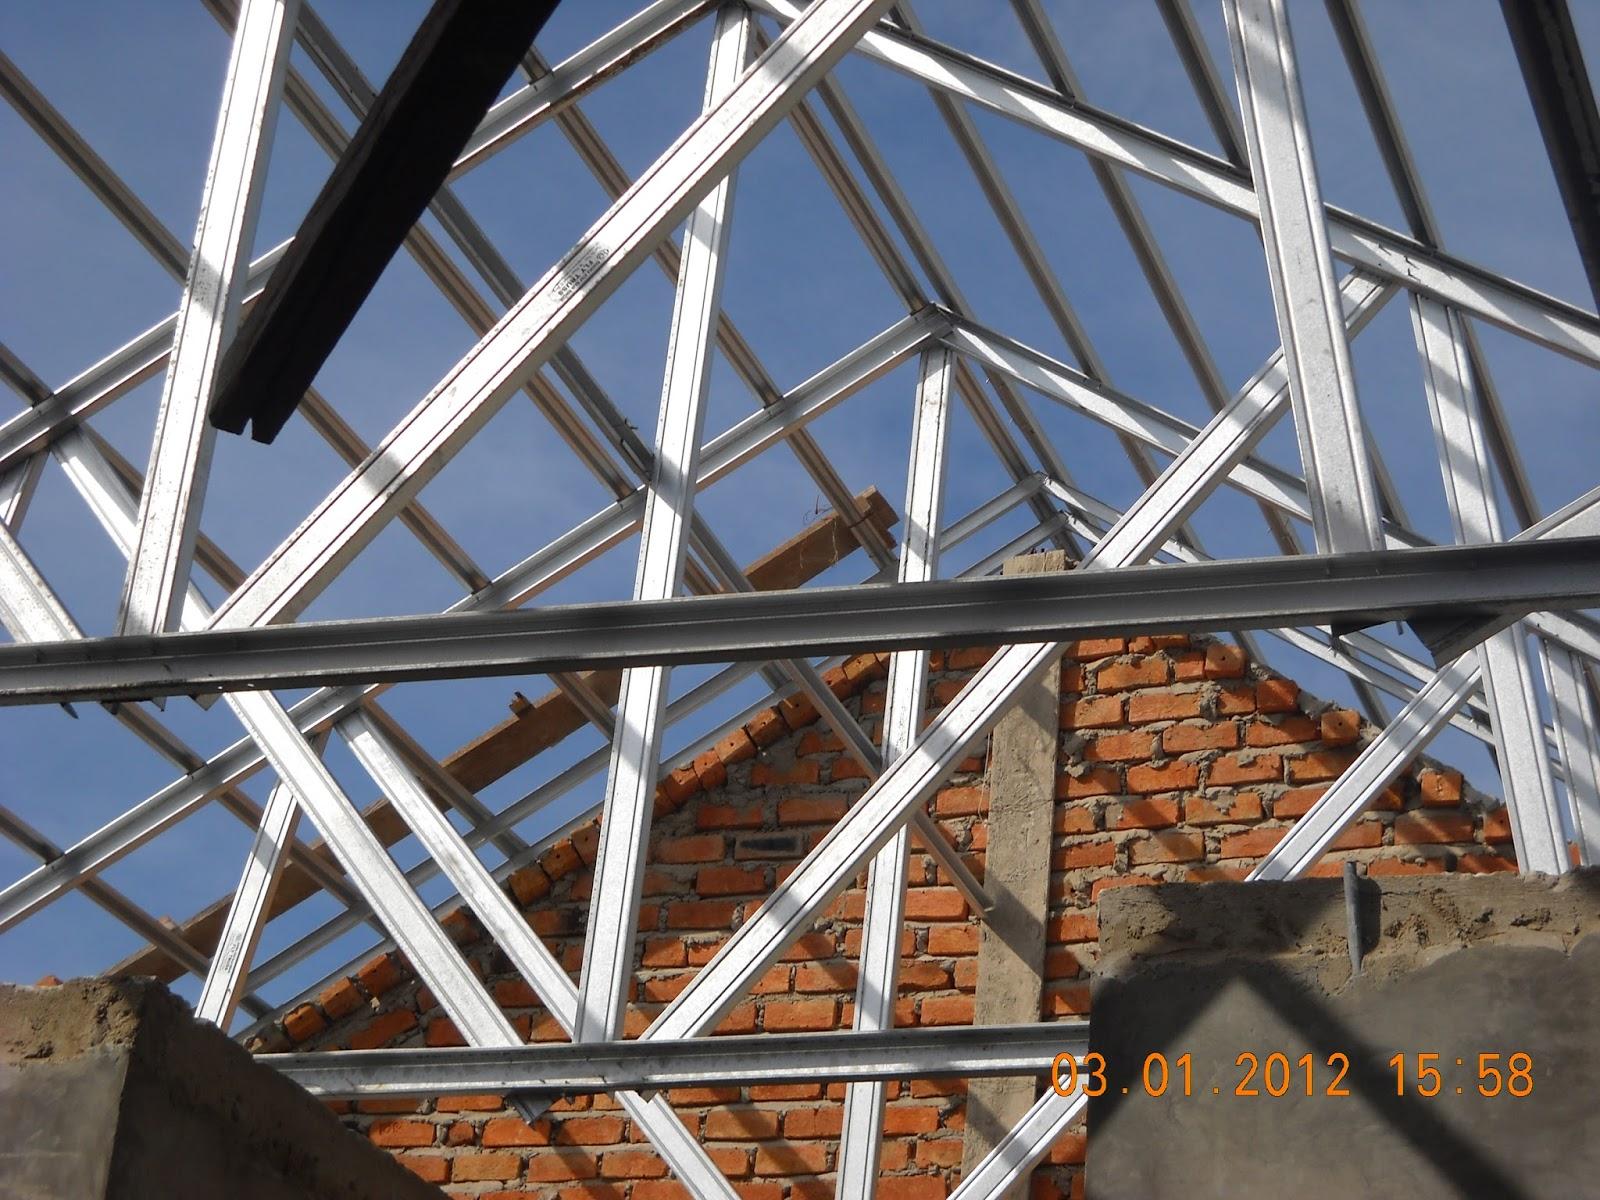 Perbandingan Harga Baja Ringan Vs Kayu Pemasangan Atap Di Ponorogo